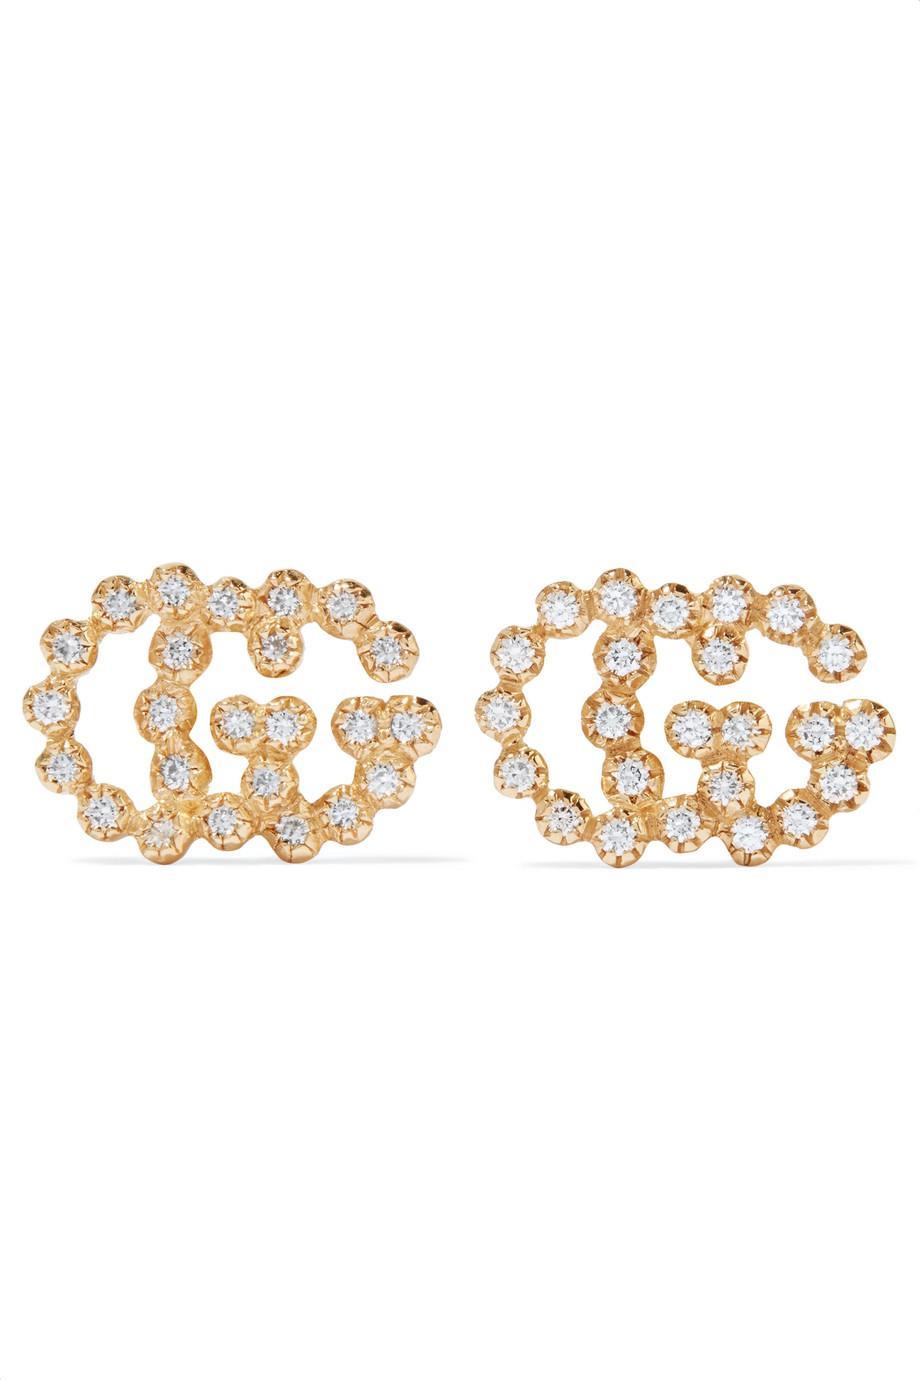 Gucci 18-karat Gold Diamond Earrings 9RCIhiwJw